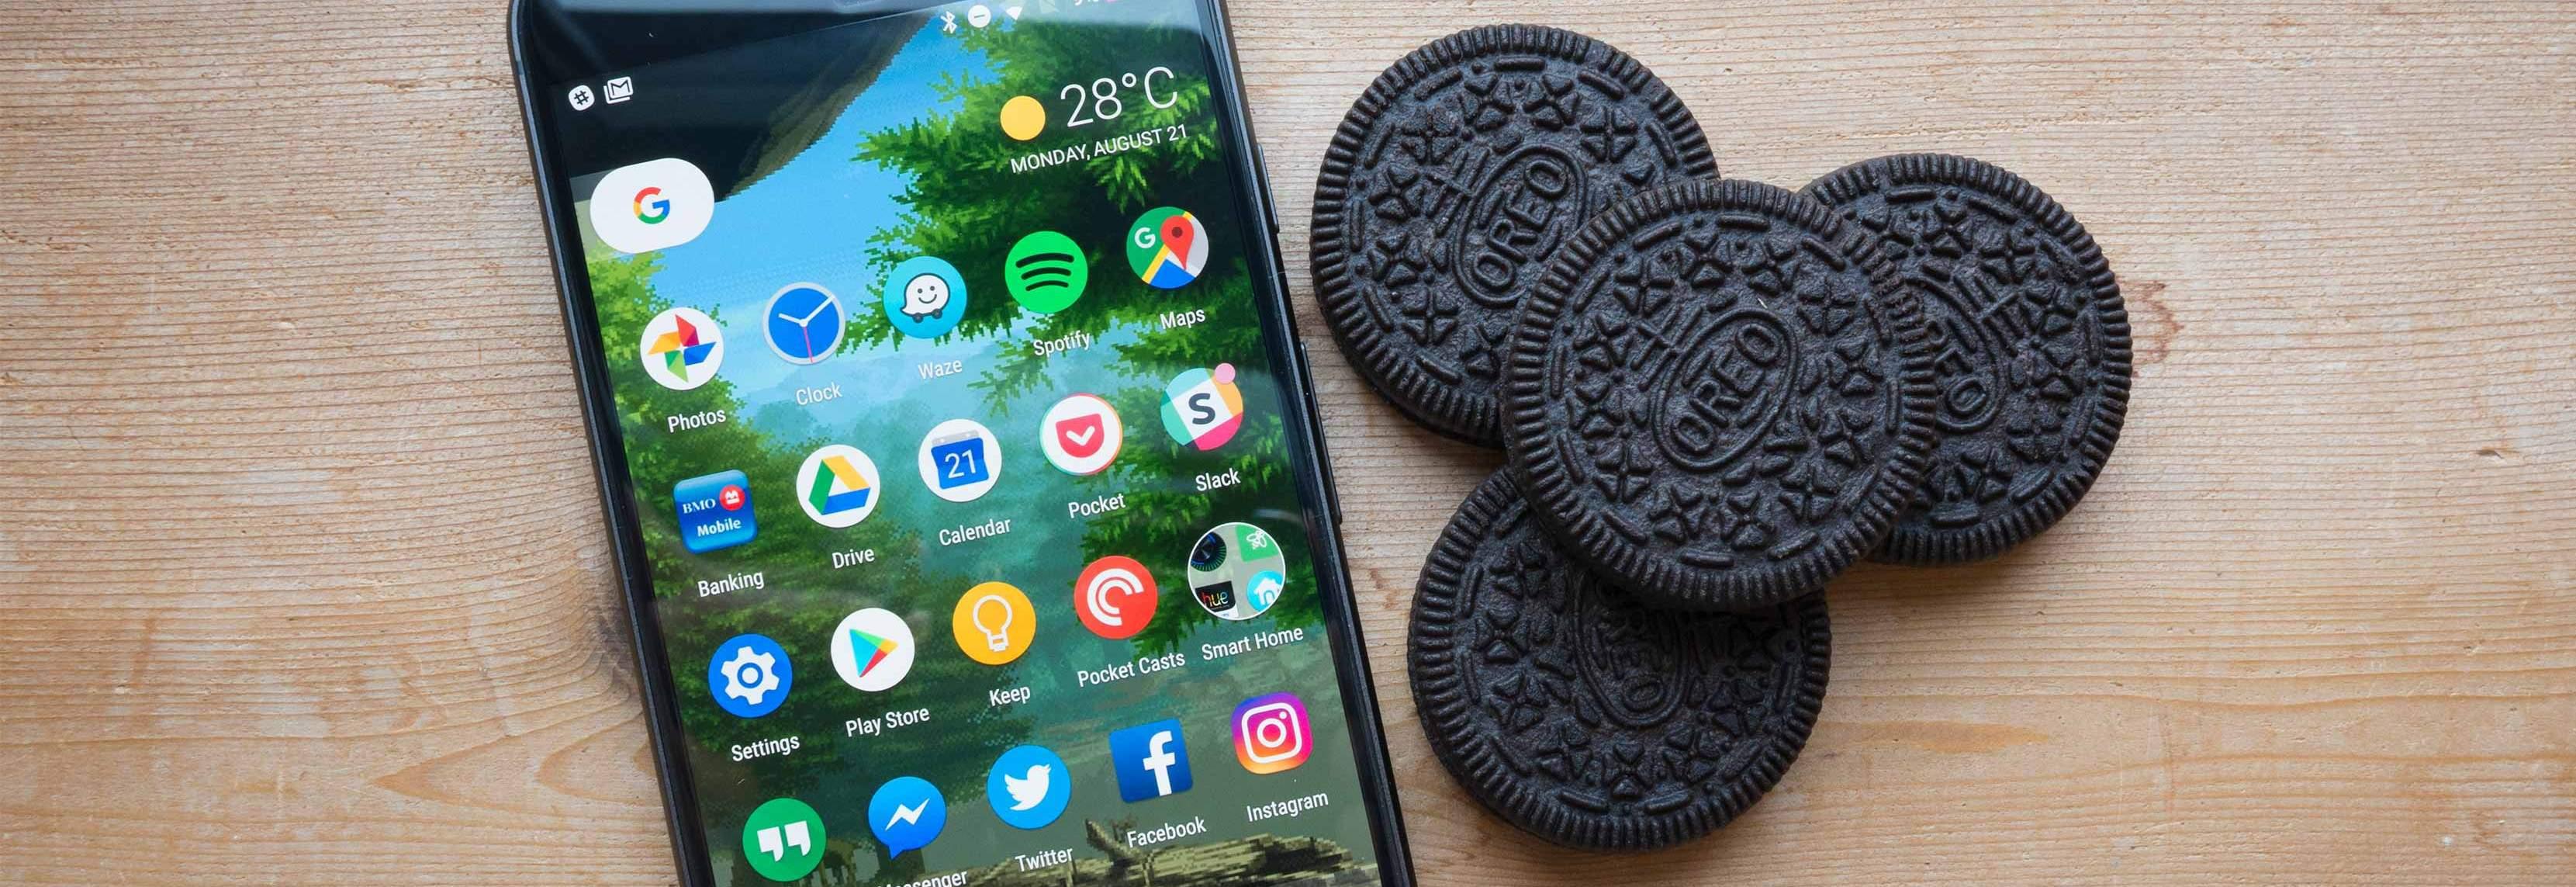 У вас смартфон на Android? Скорее всего, он уязвим, но это не проблема